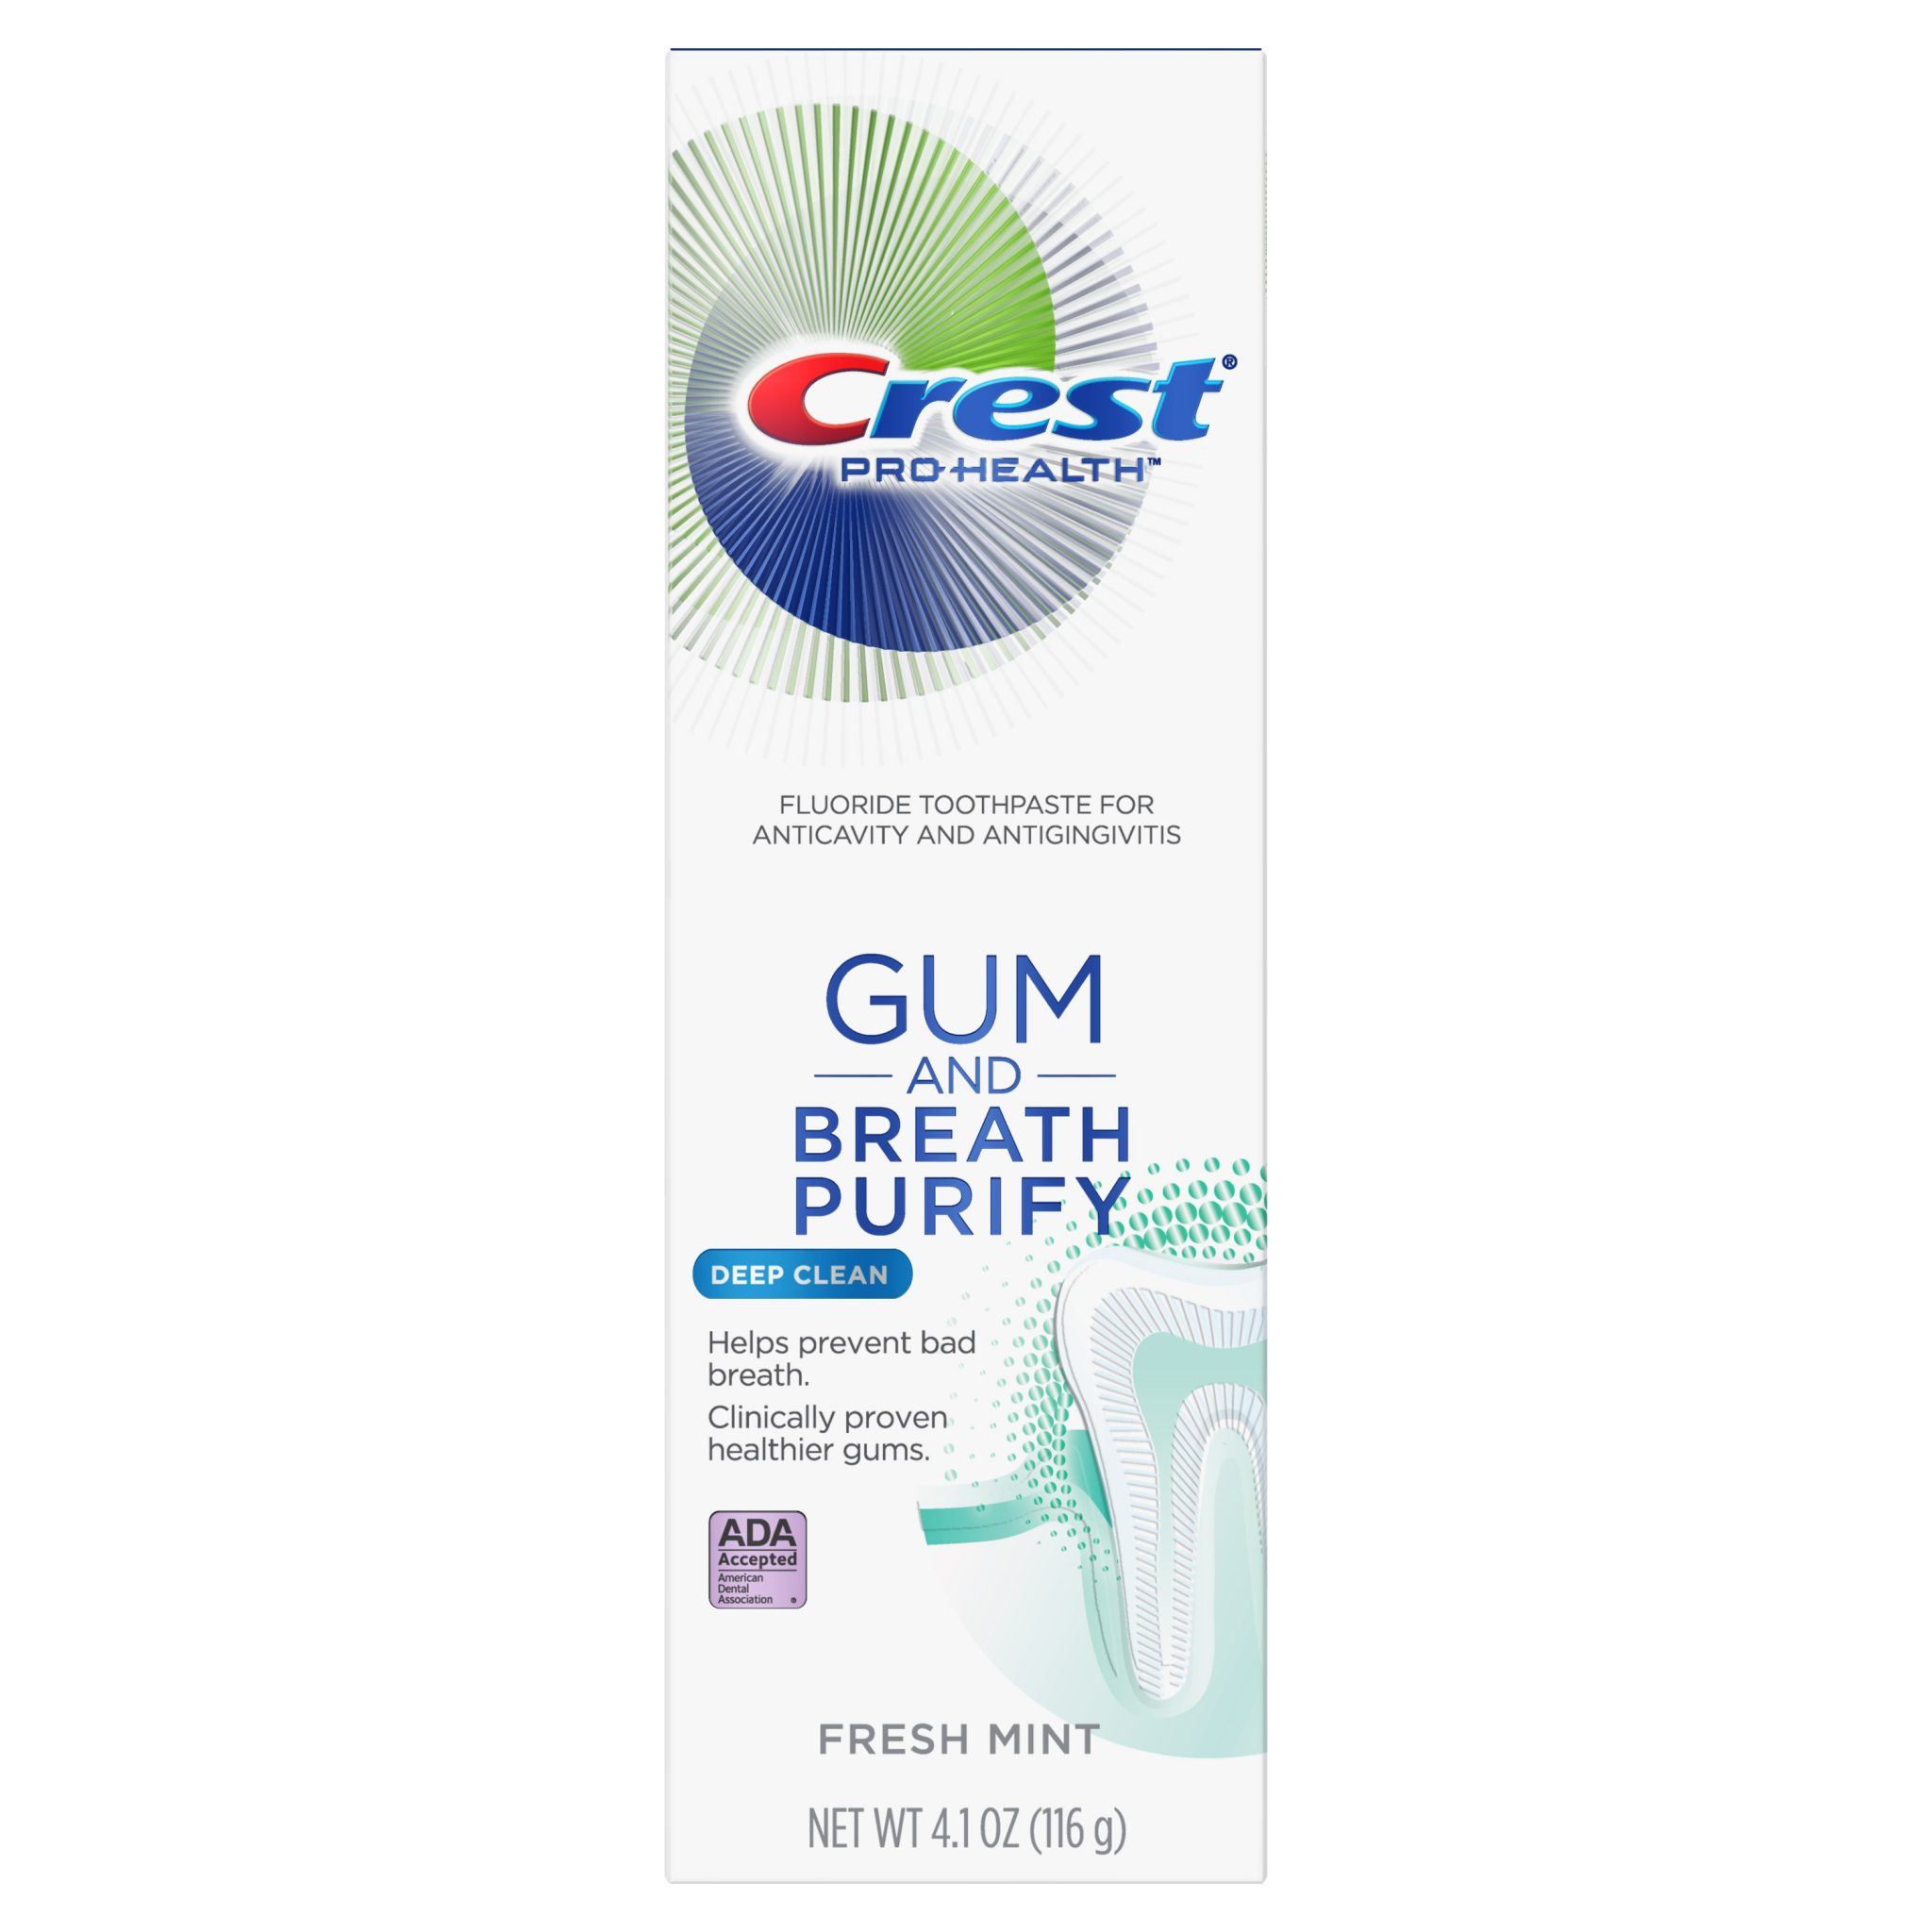 Zubní pasta pro svěží dech CREST GUM AND BREATH PURIFY Deep Clean